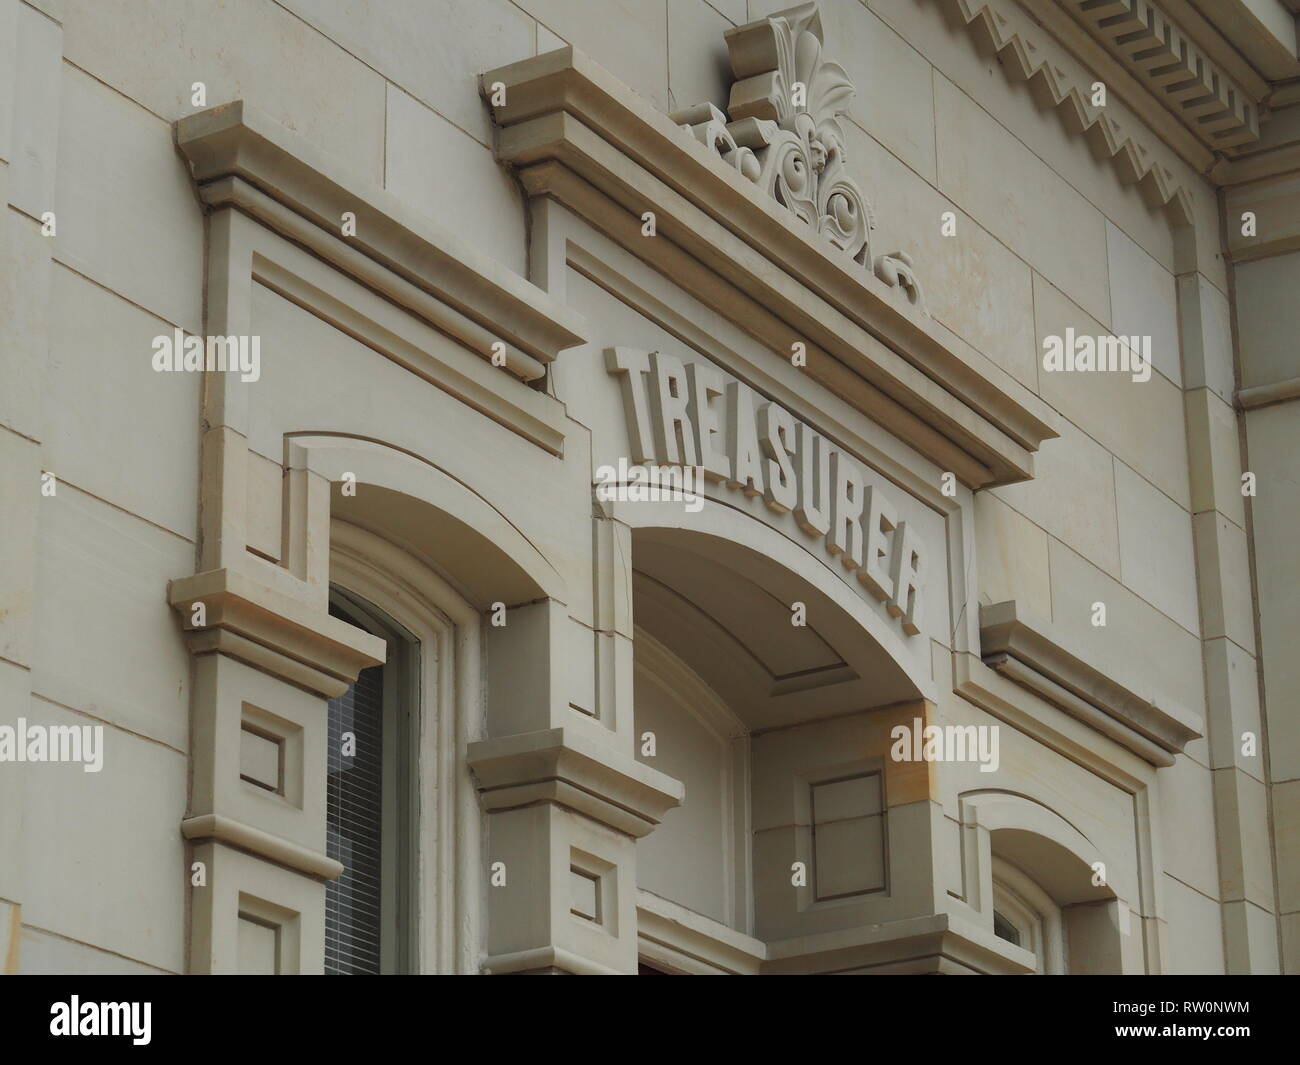 treasury  / treasurer of Chillicothe Ohio USA Building / sign - Stock Image